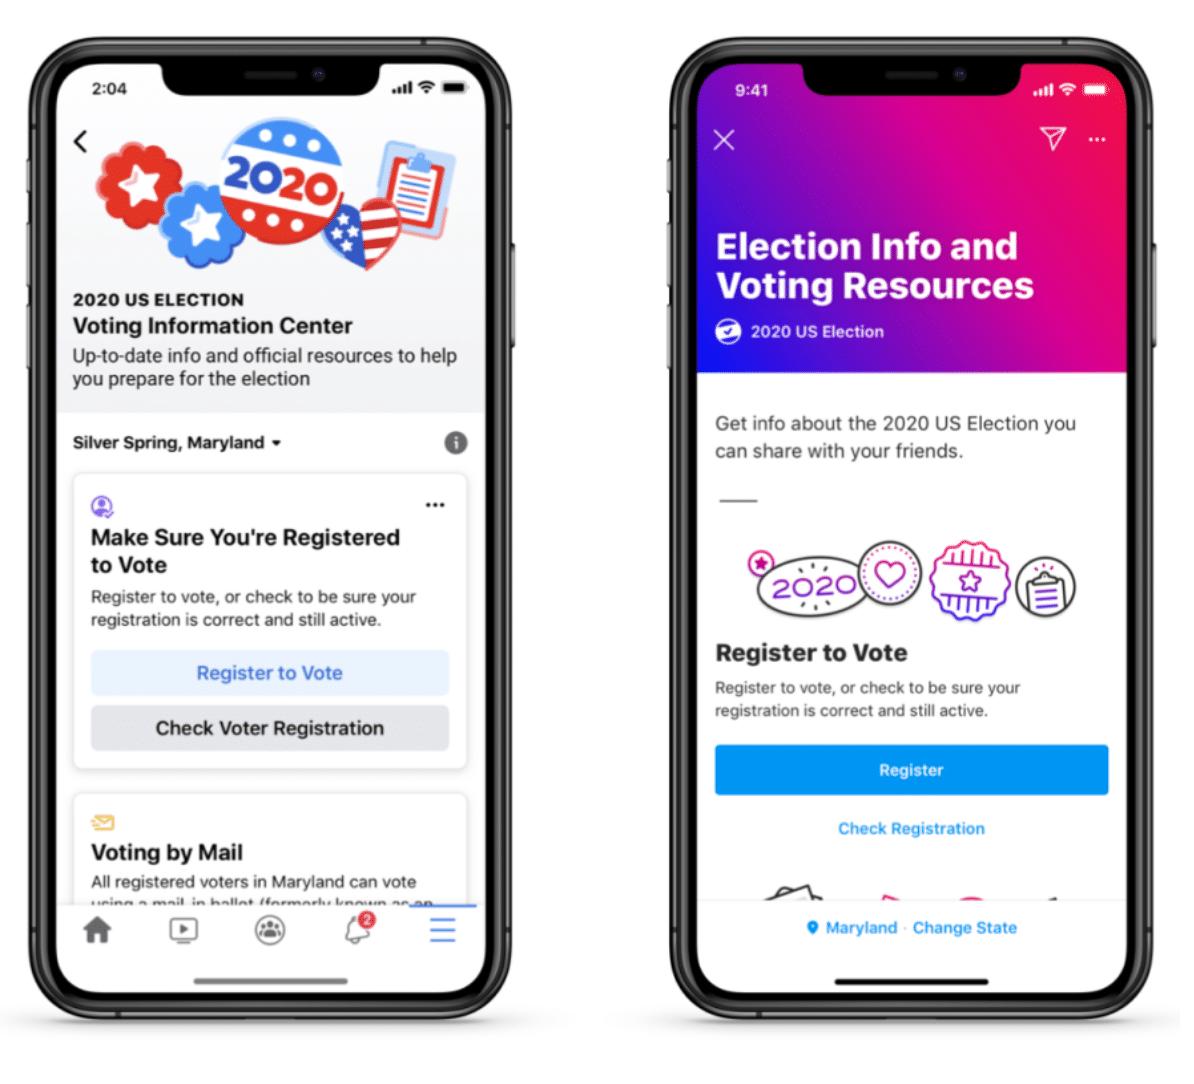 2020 Voting Information Center